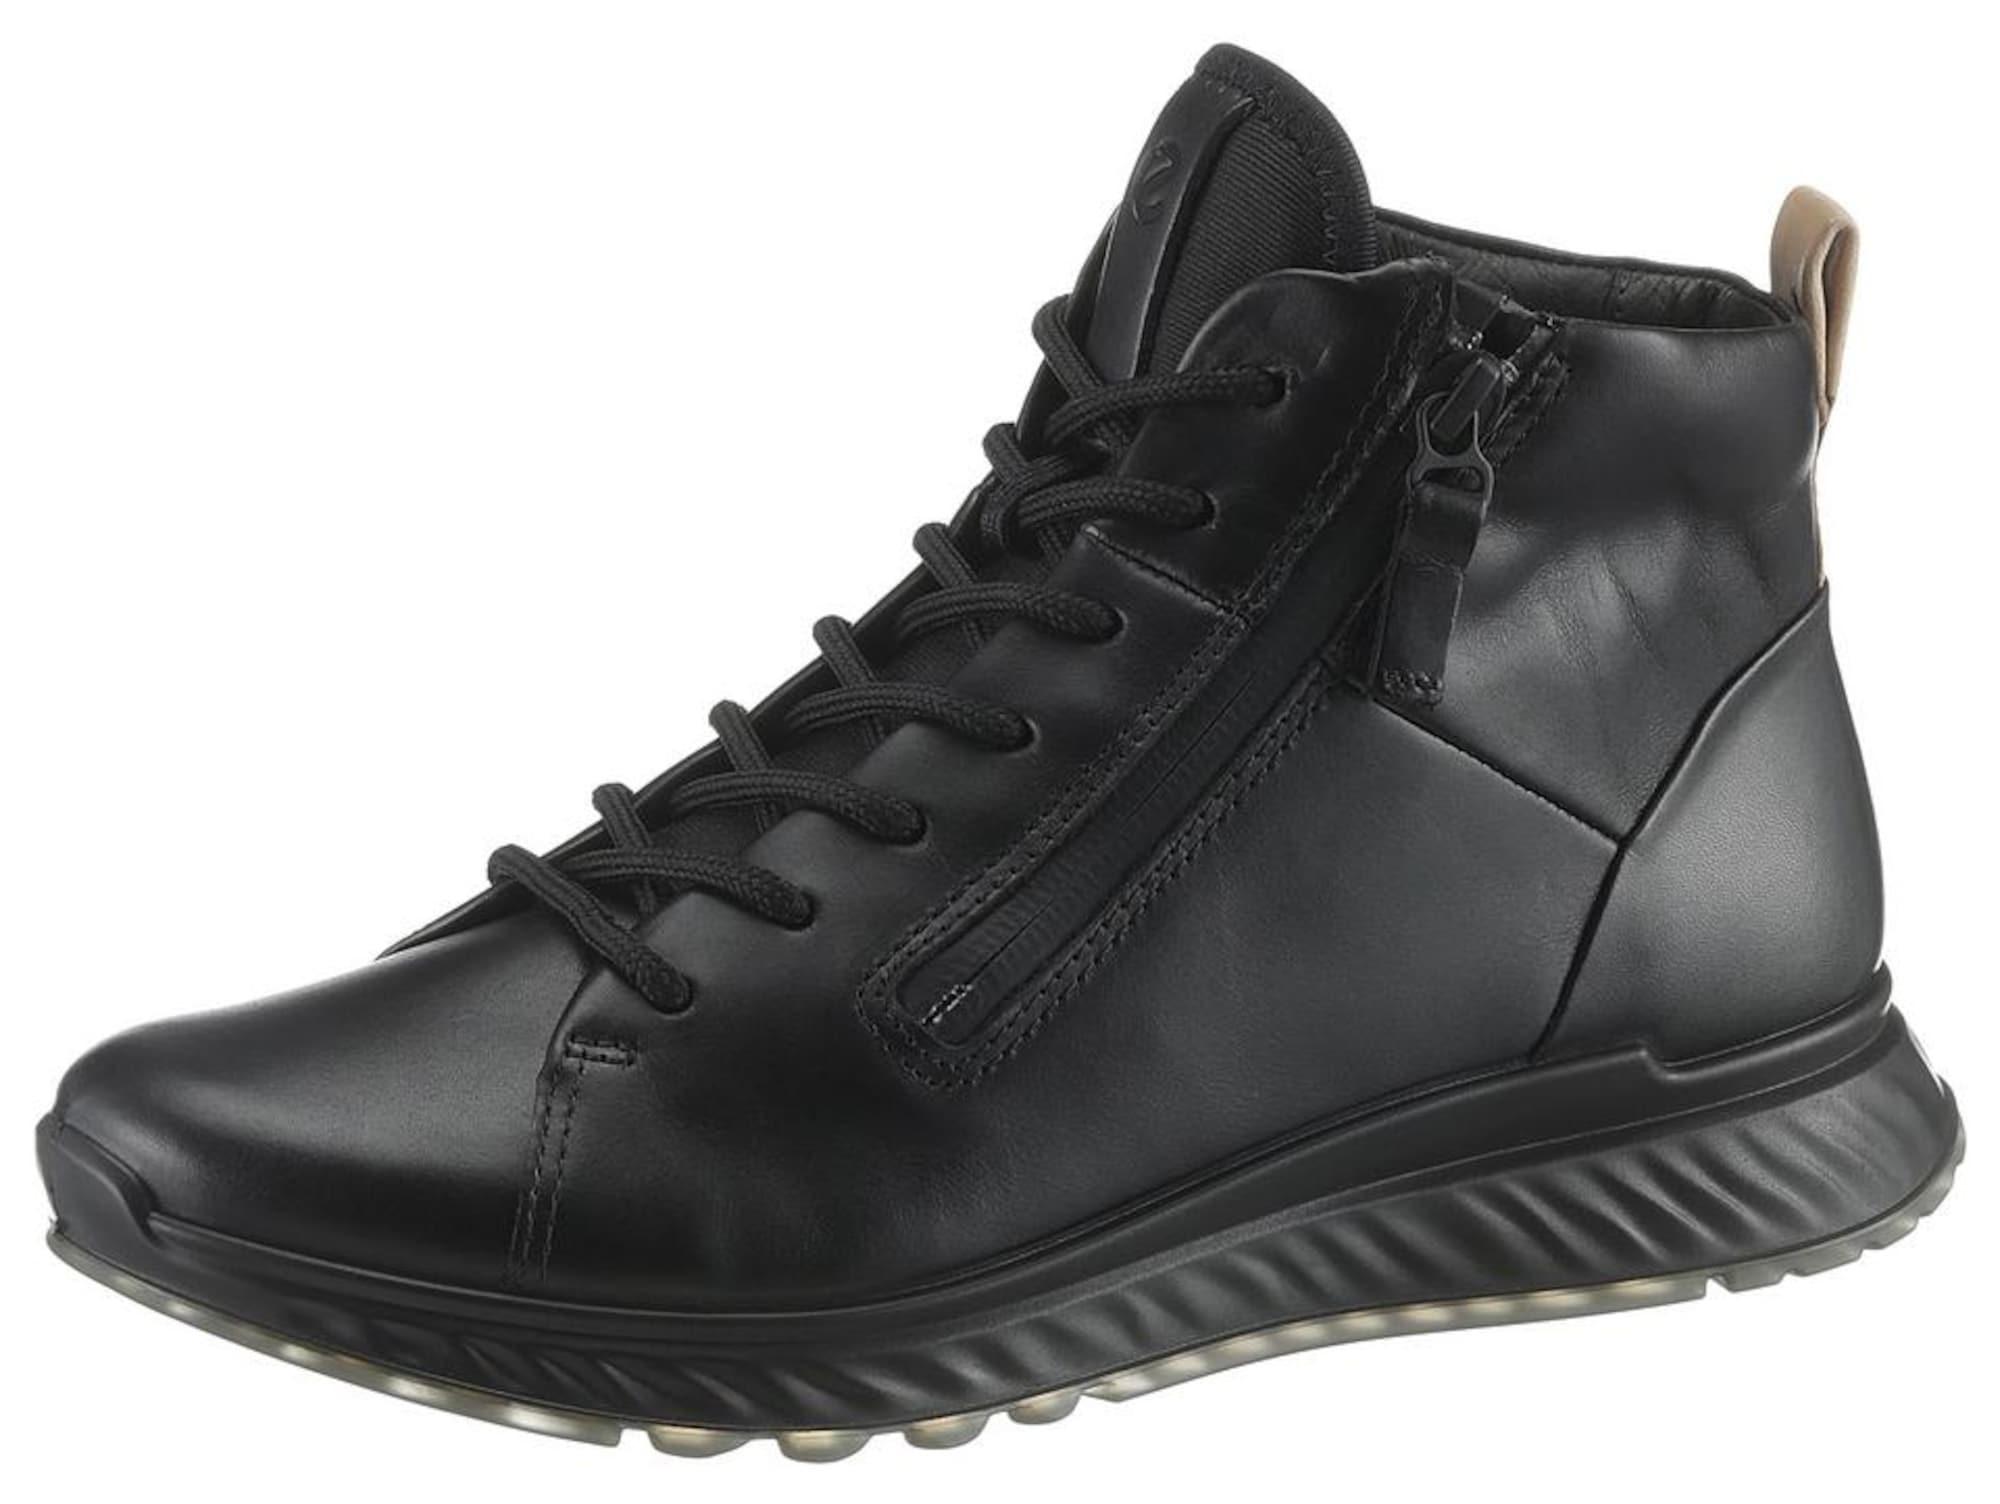 Schnürboots | Schuhe > Boots > Schnürboots | Schwarz | ECCO